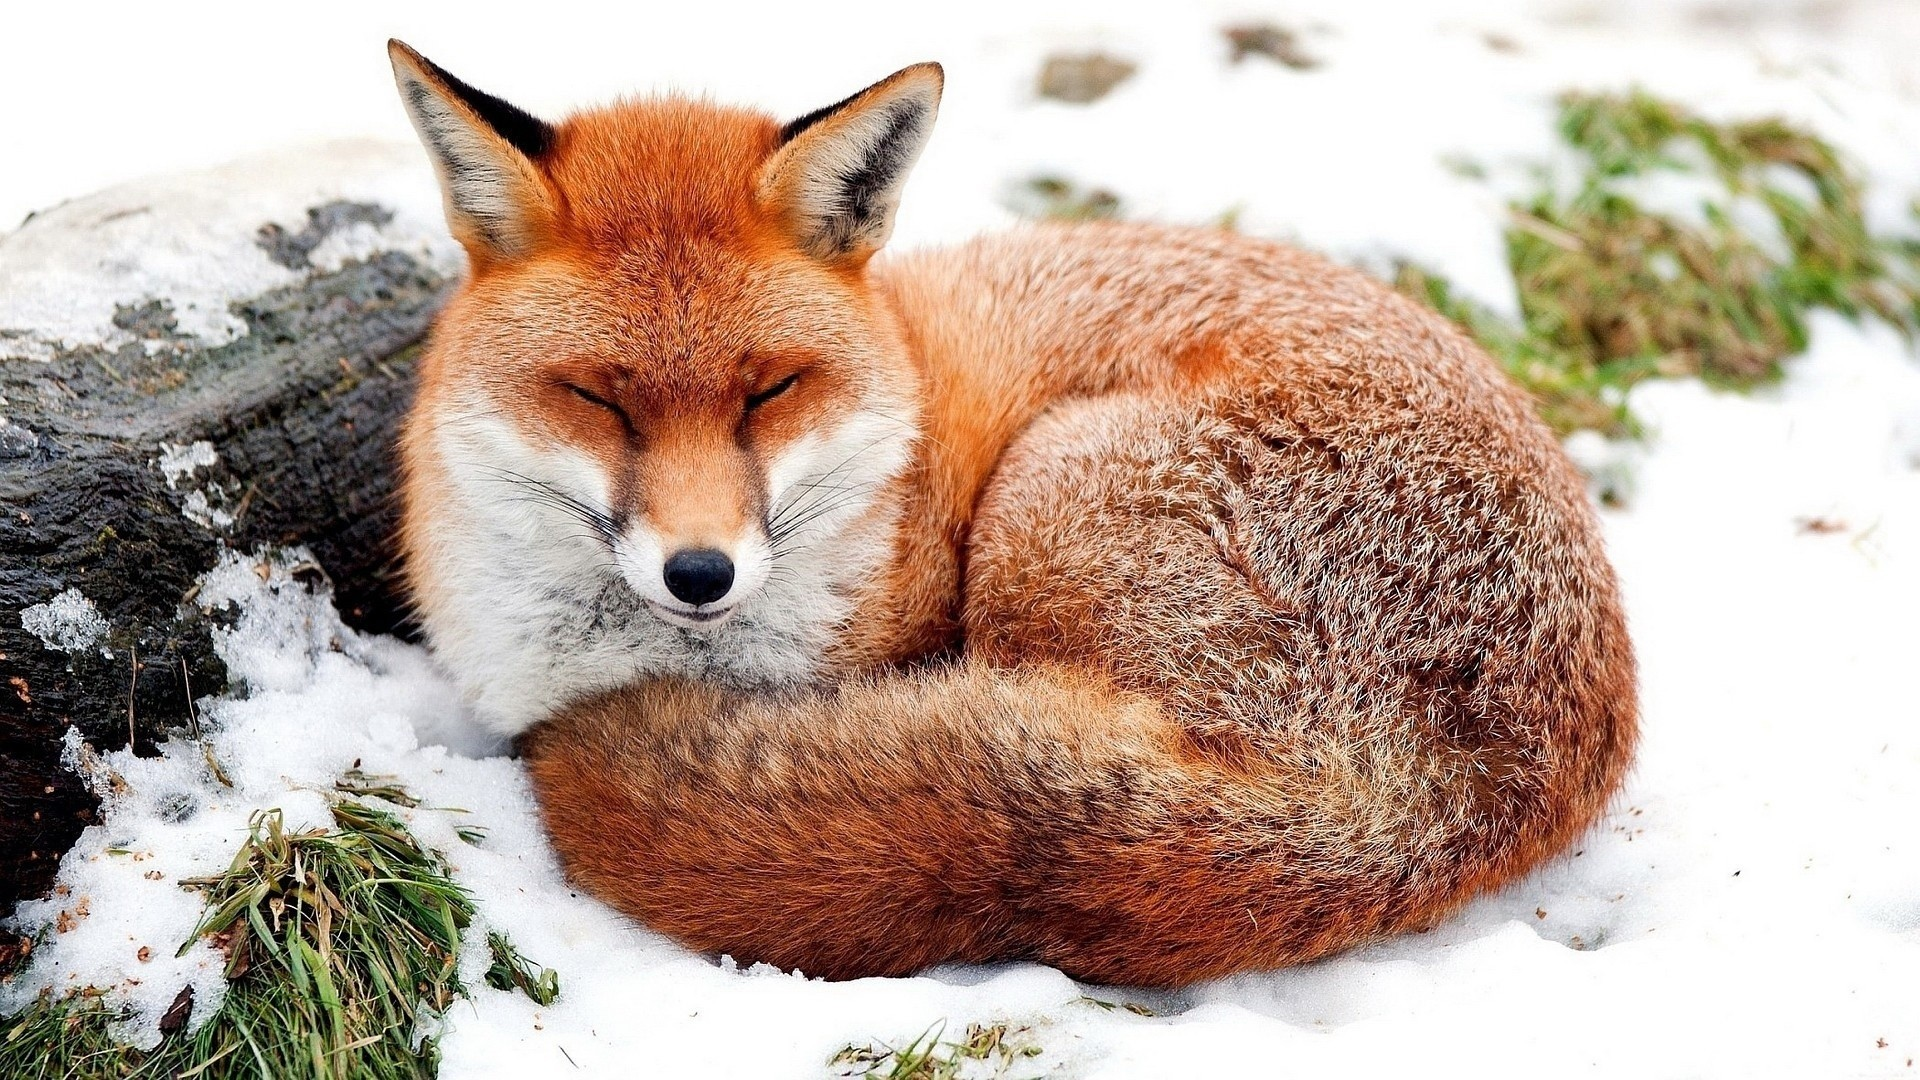 Fox wallpaper photo hd